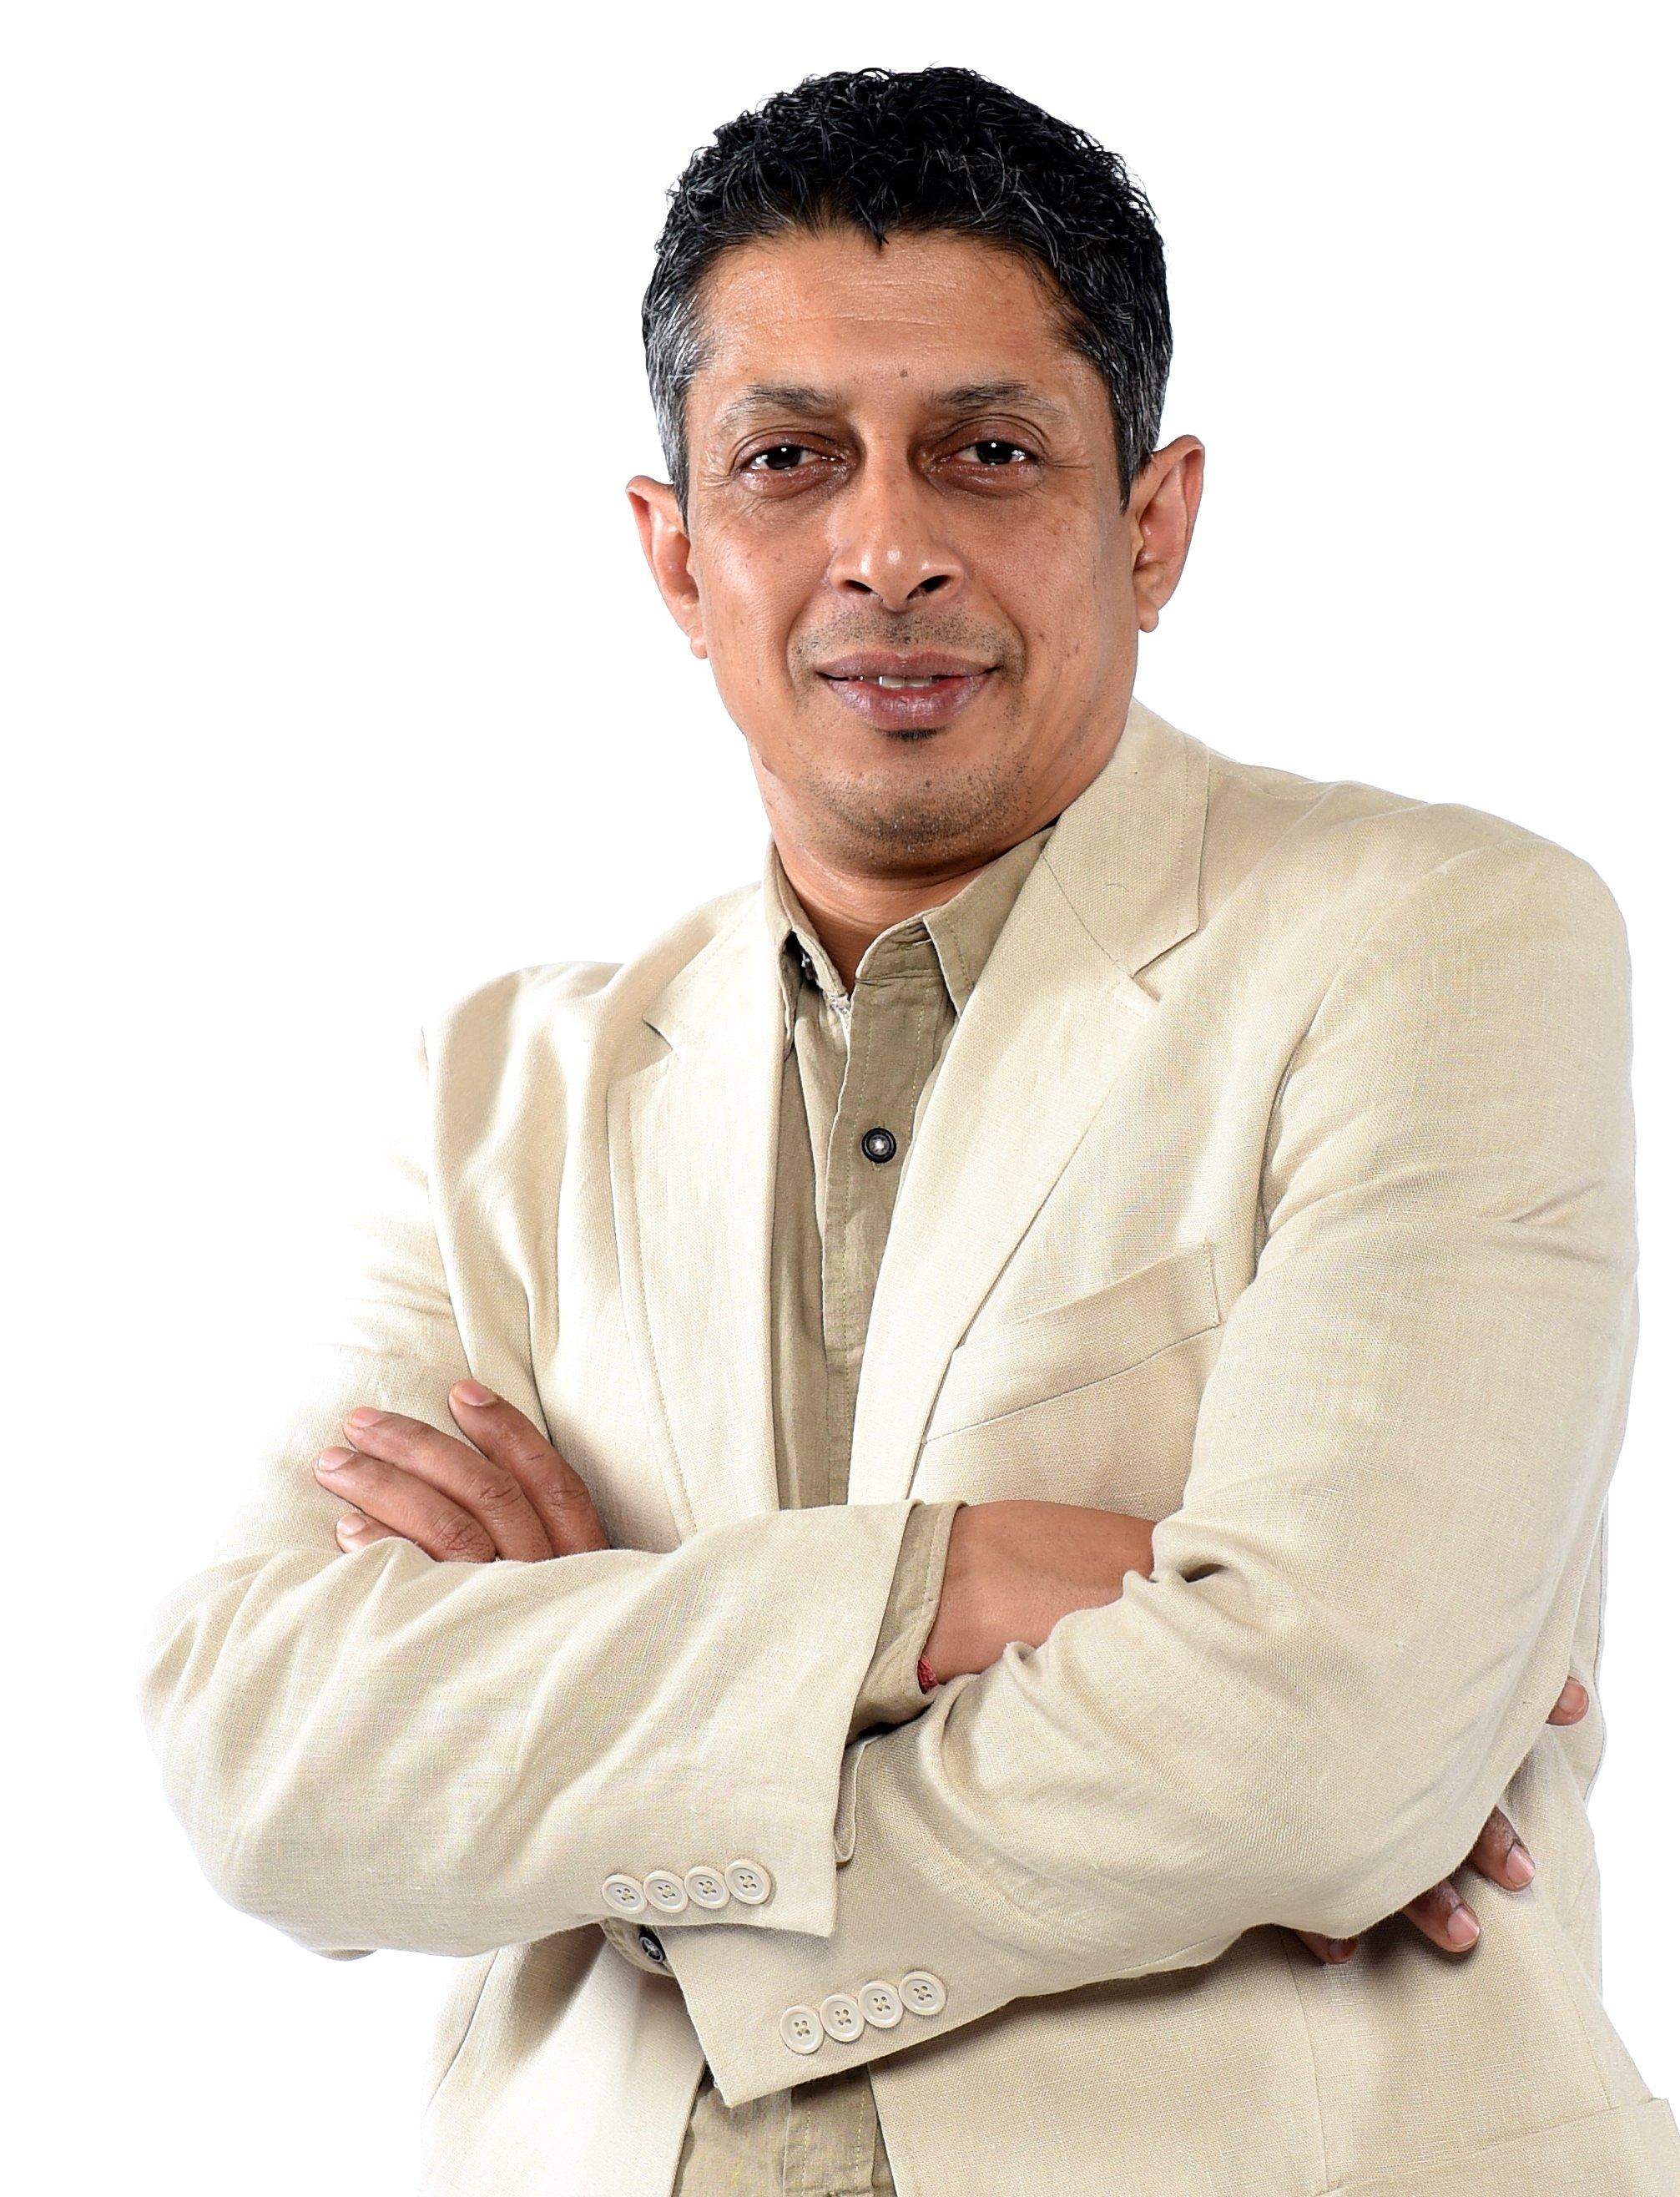 DBS Speaker 2015: Rajesh Kumar Jindal, Head of Marketing, SAP- Indian Subcontinent